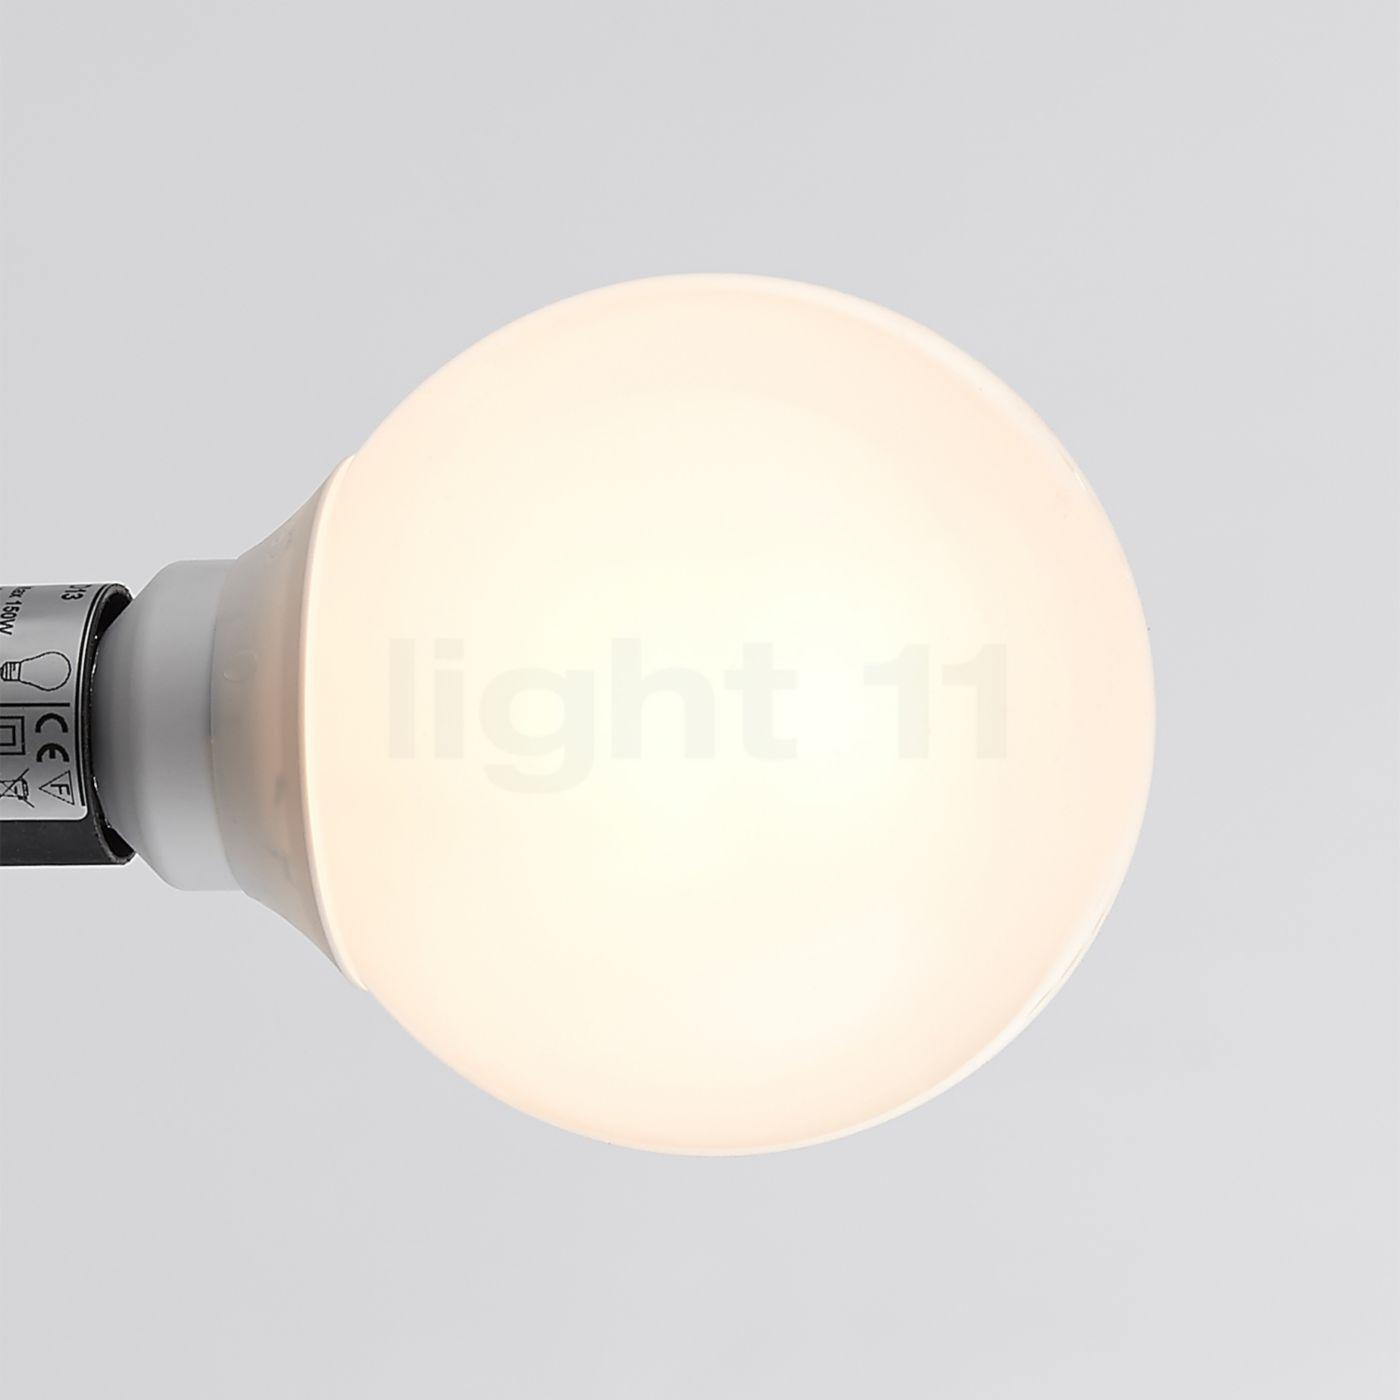 Artemide Miconos Soffitto Ceiling lights buy at light11eu